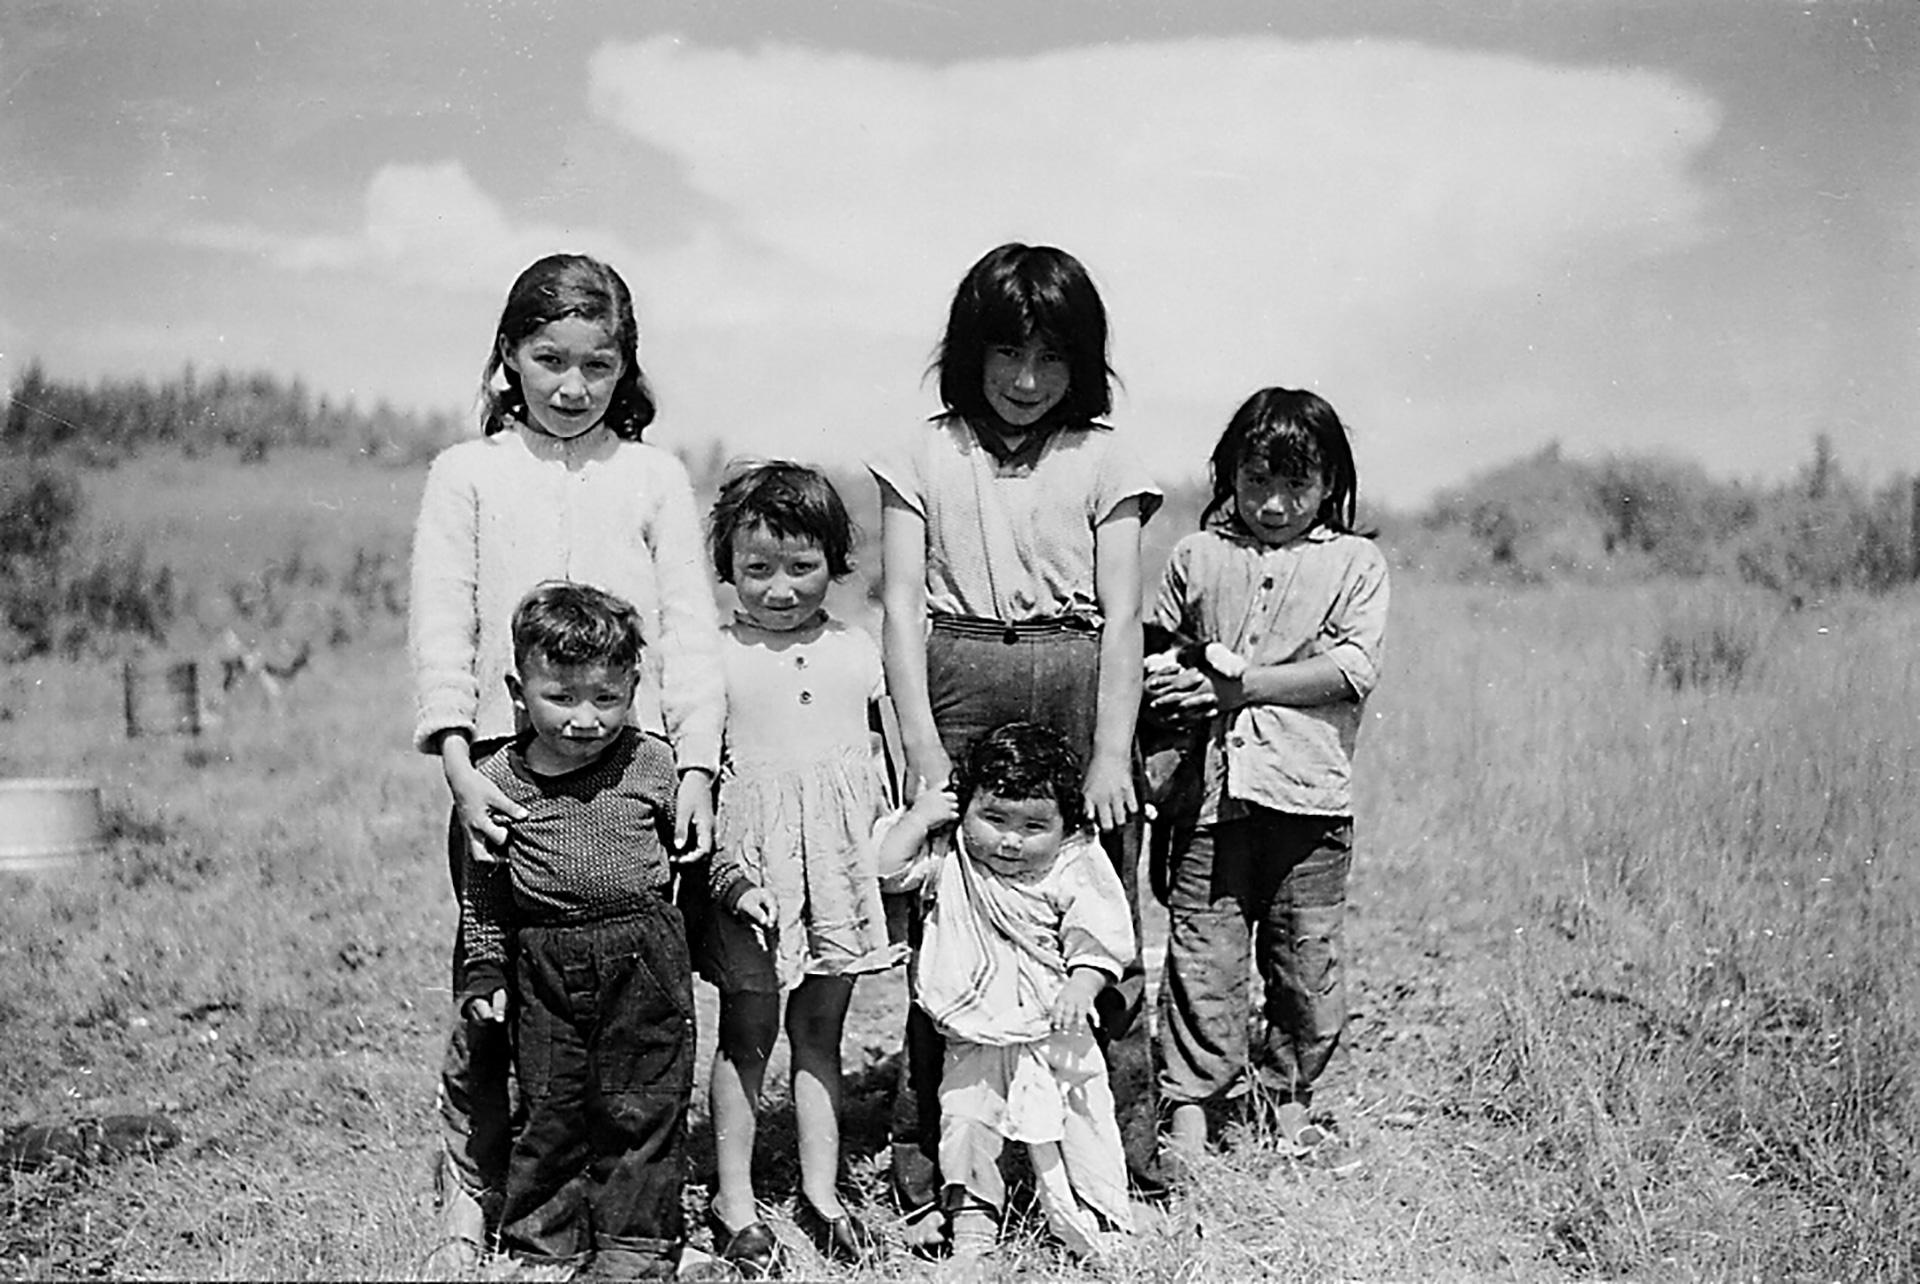 Children at South Indian Lake